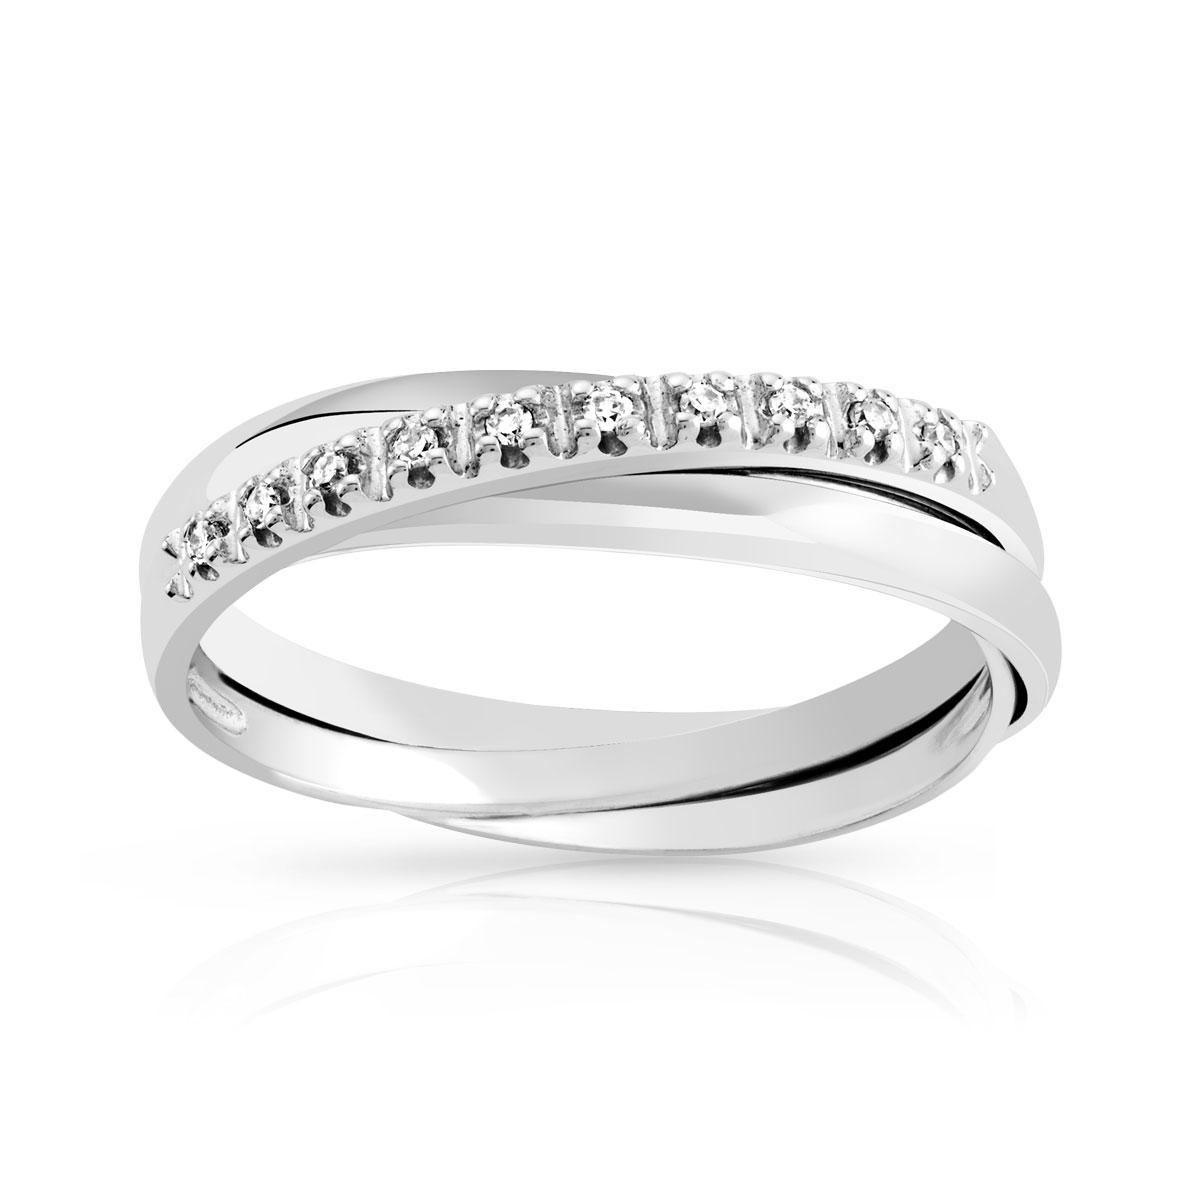 bague or 750 blanc diamant femme bague maty. Black Bedroom Furniture Sets. Home Design Ideas